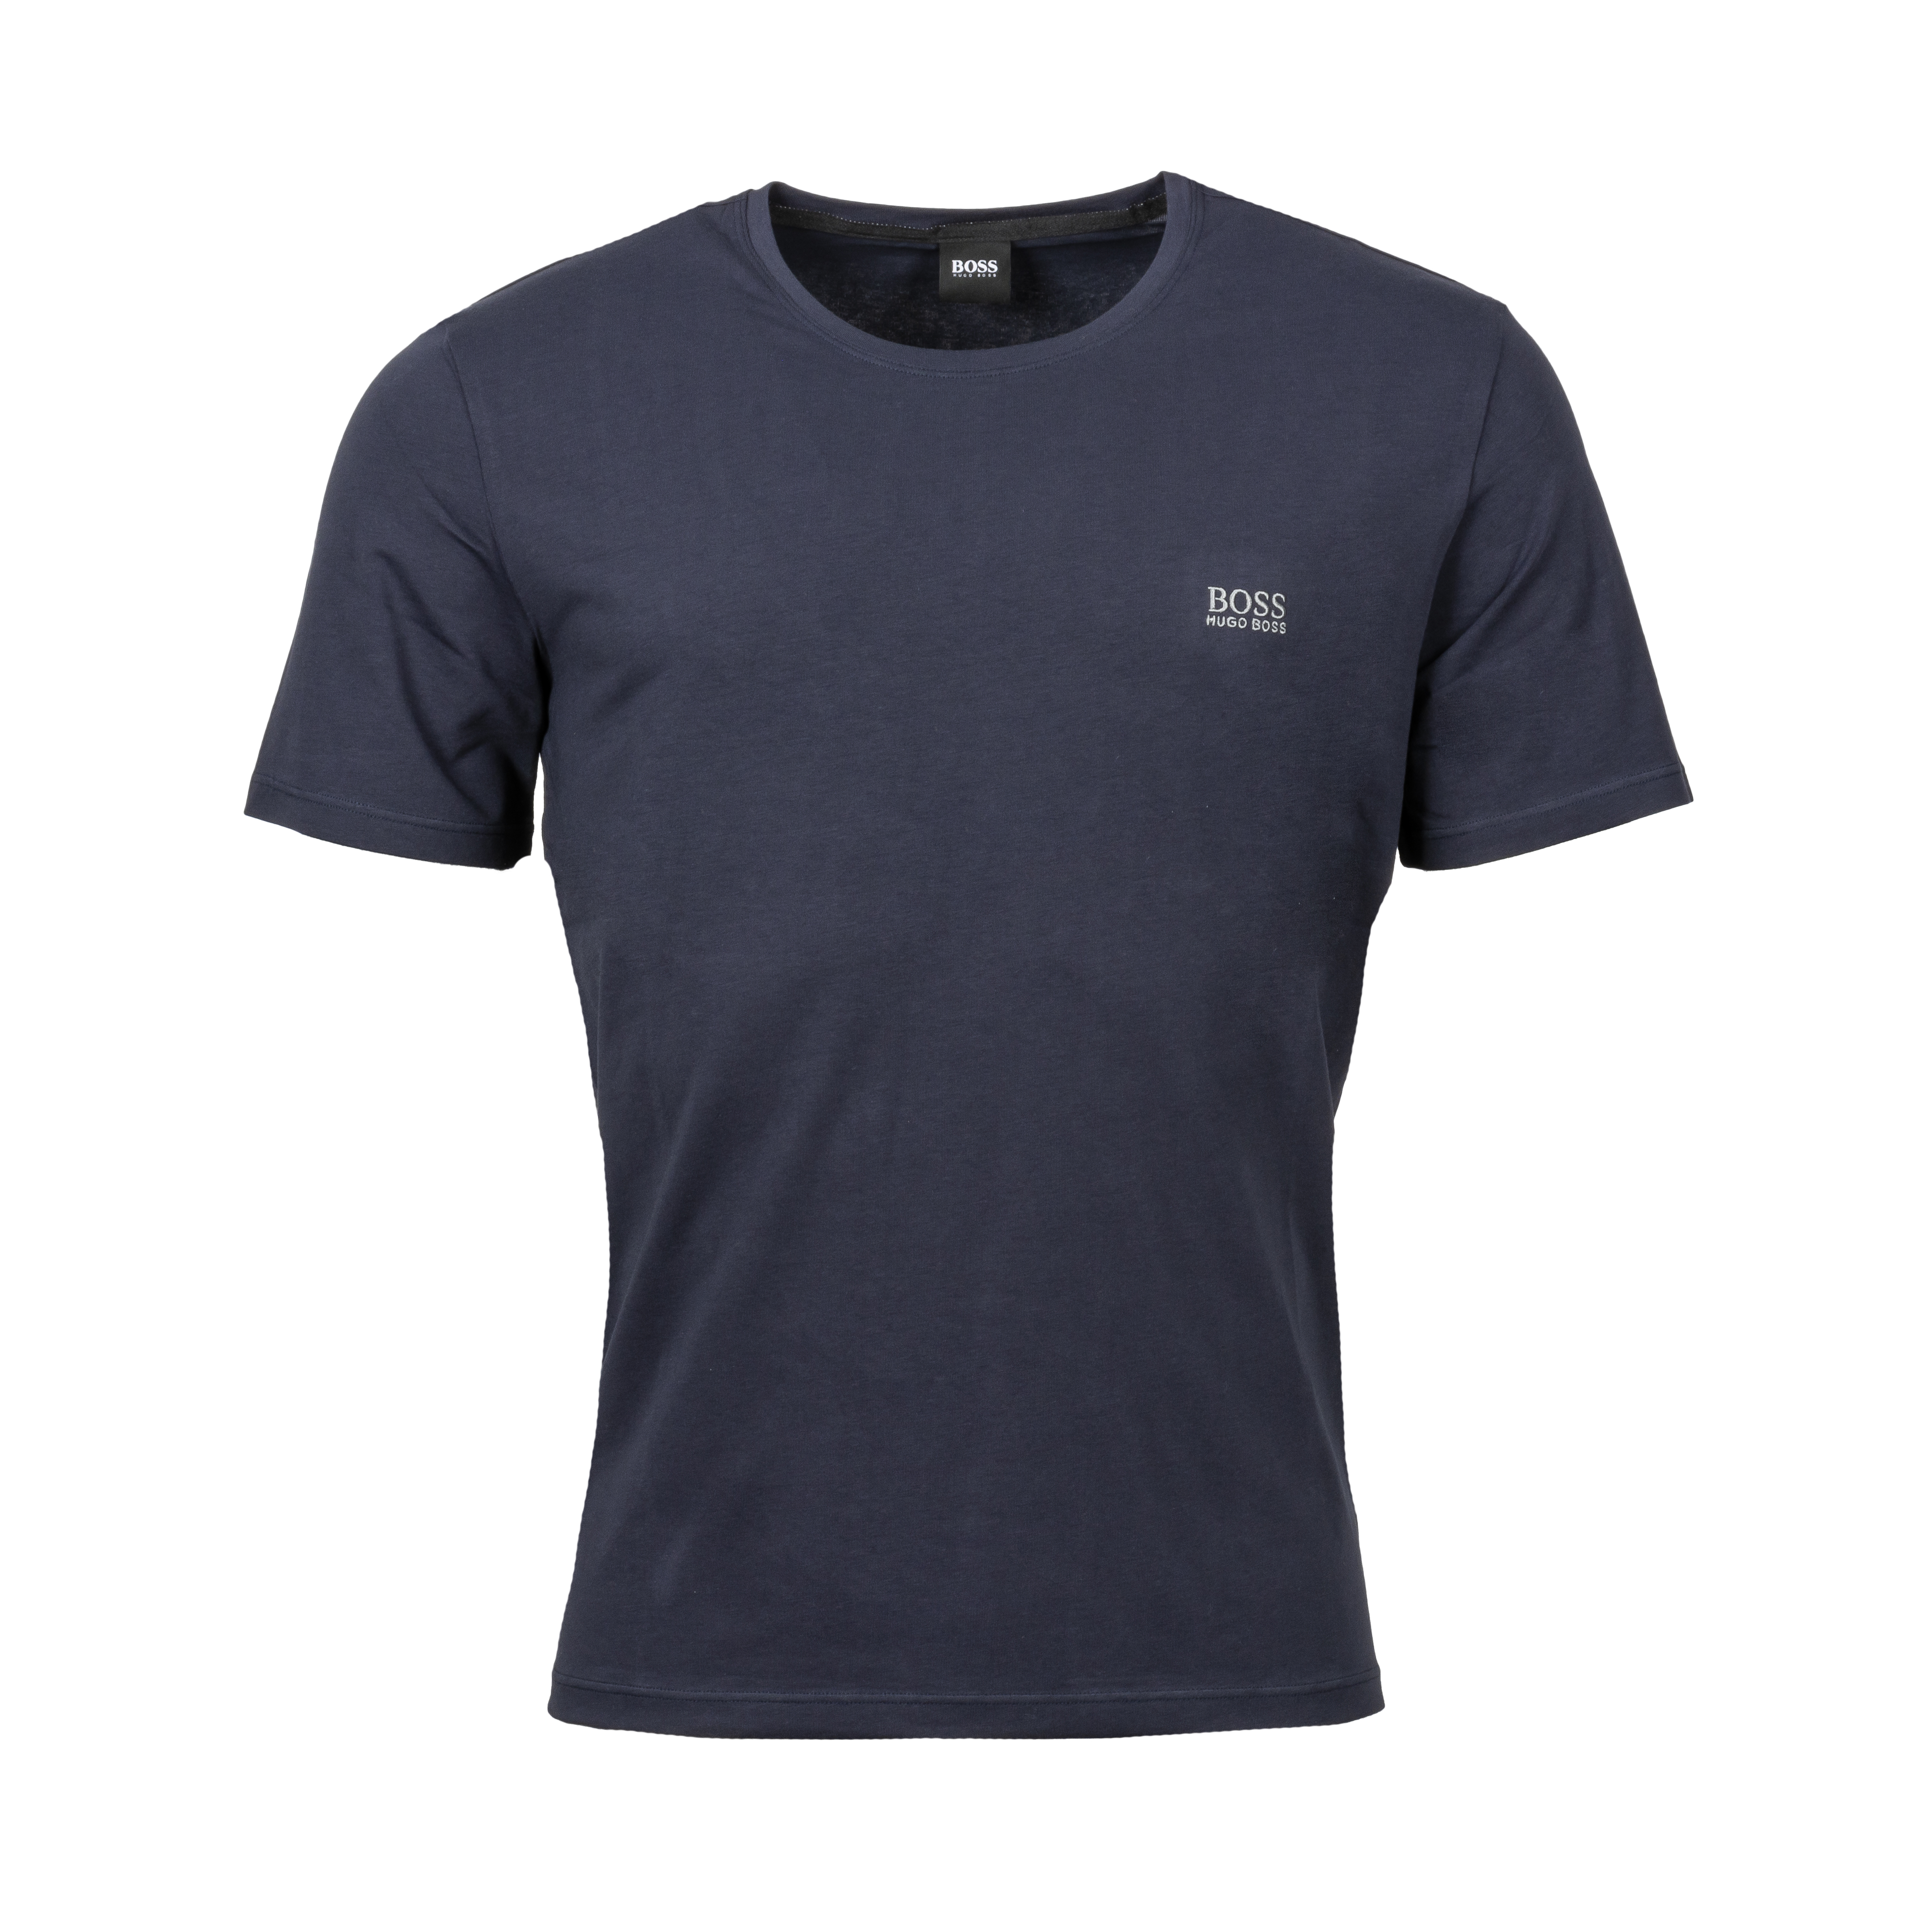 Tee-shirt col rond  en coton stretch bleu marine brodé